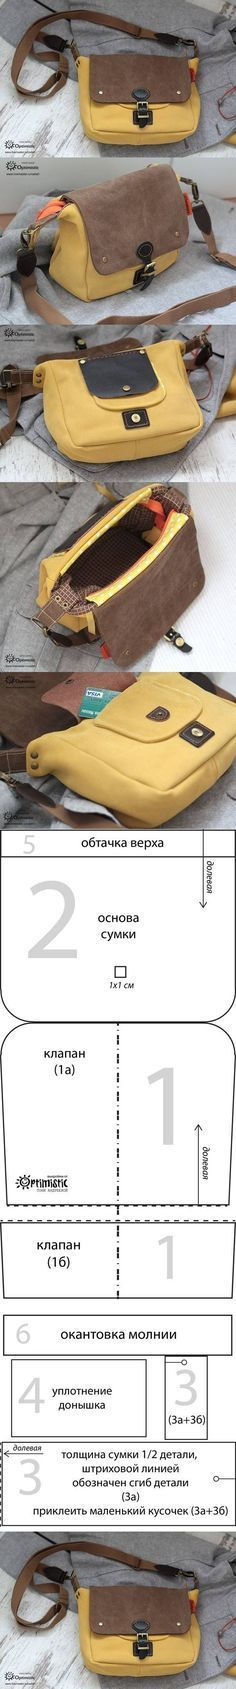 DIY Sew Handbag Pattern DIY Projects